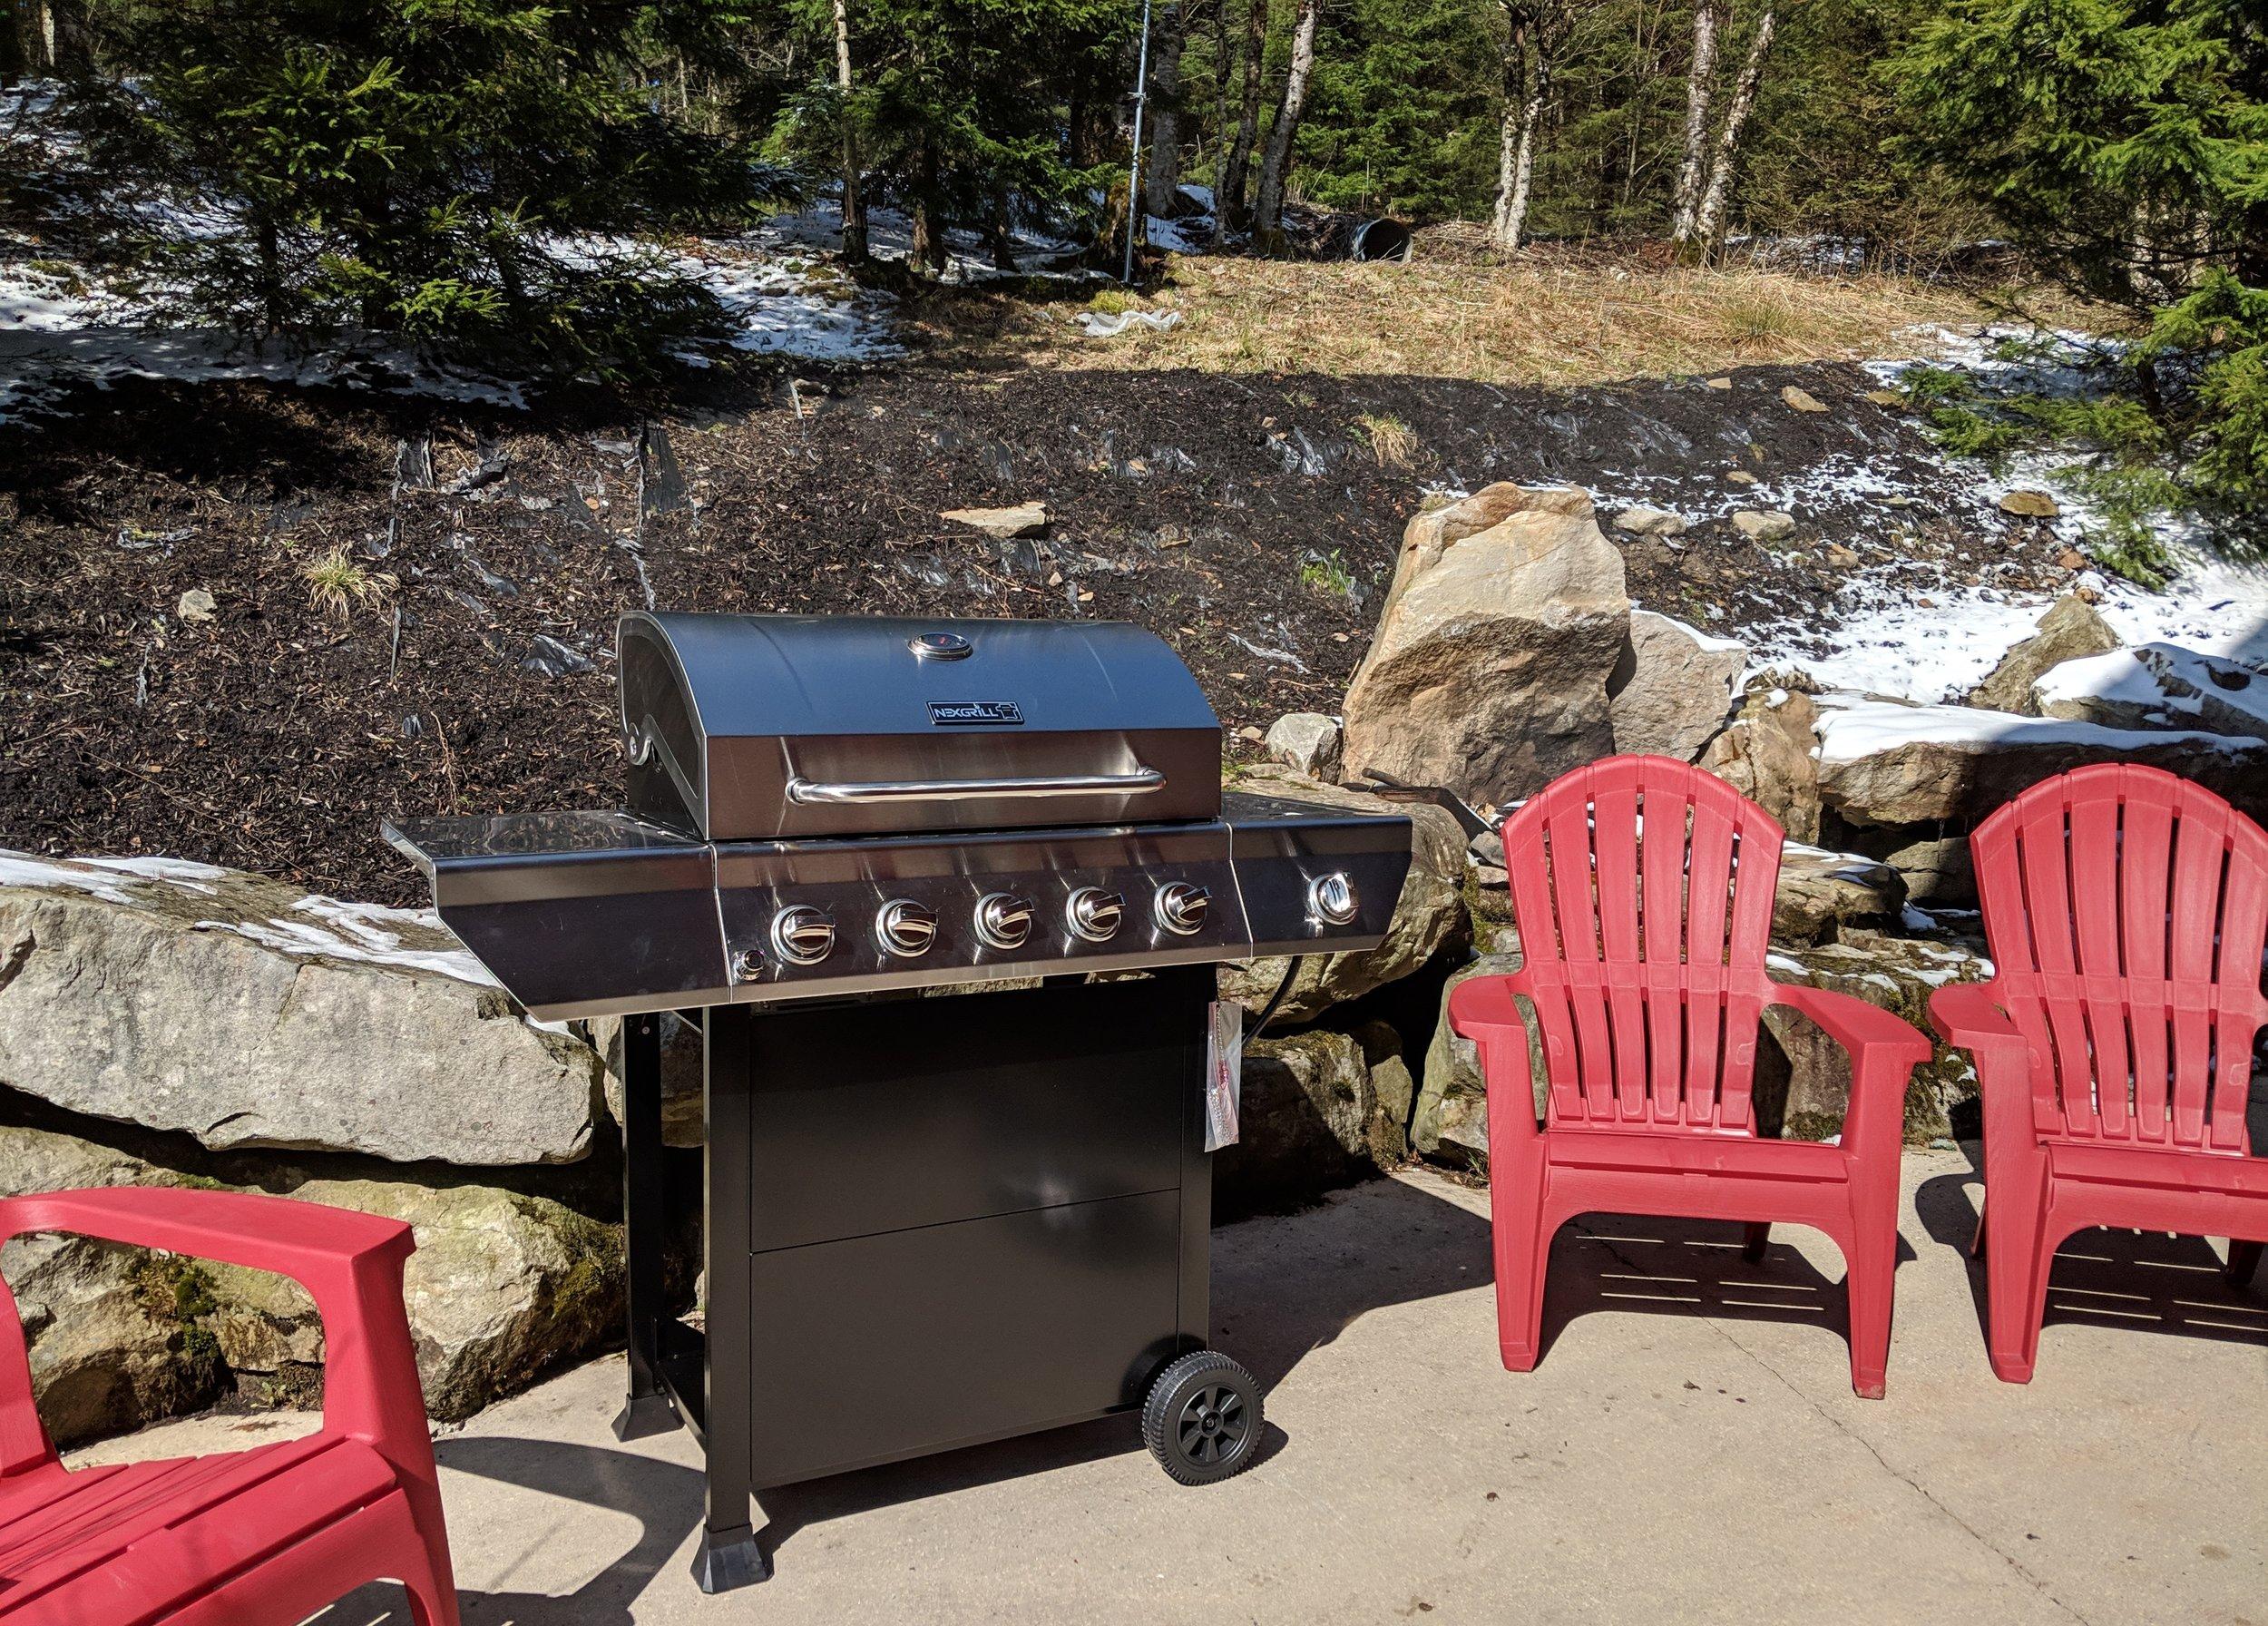 5 - Burner Propane Grill